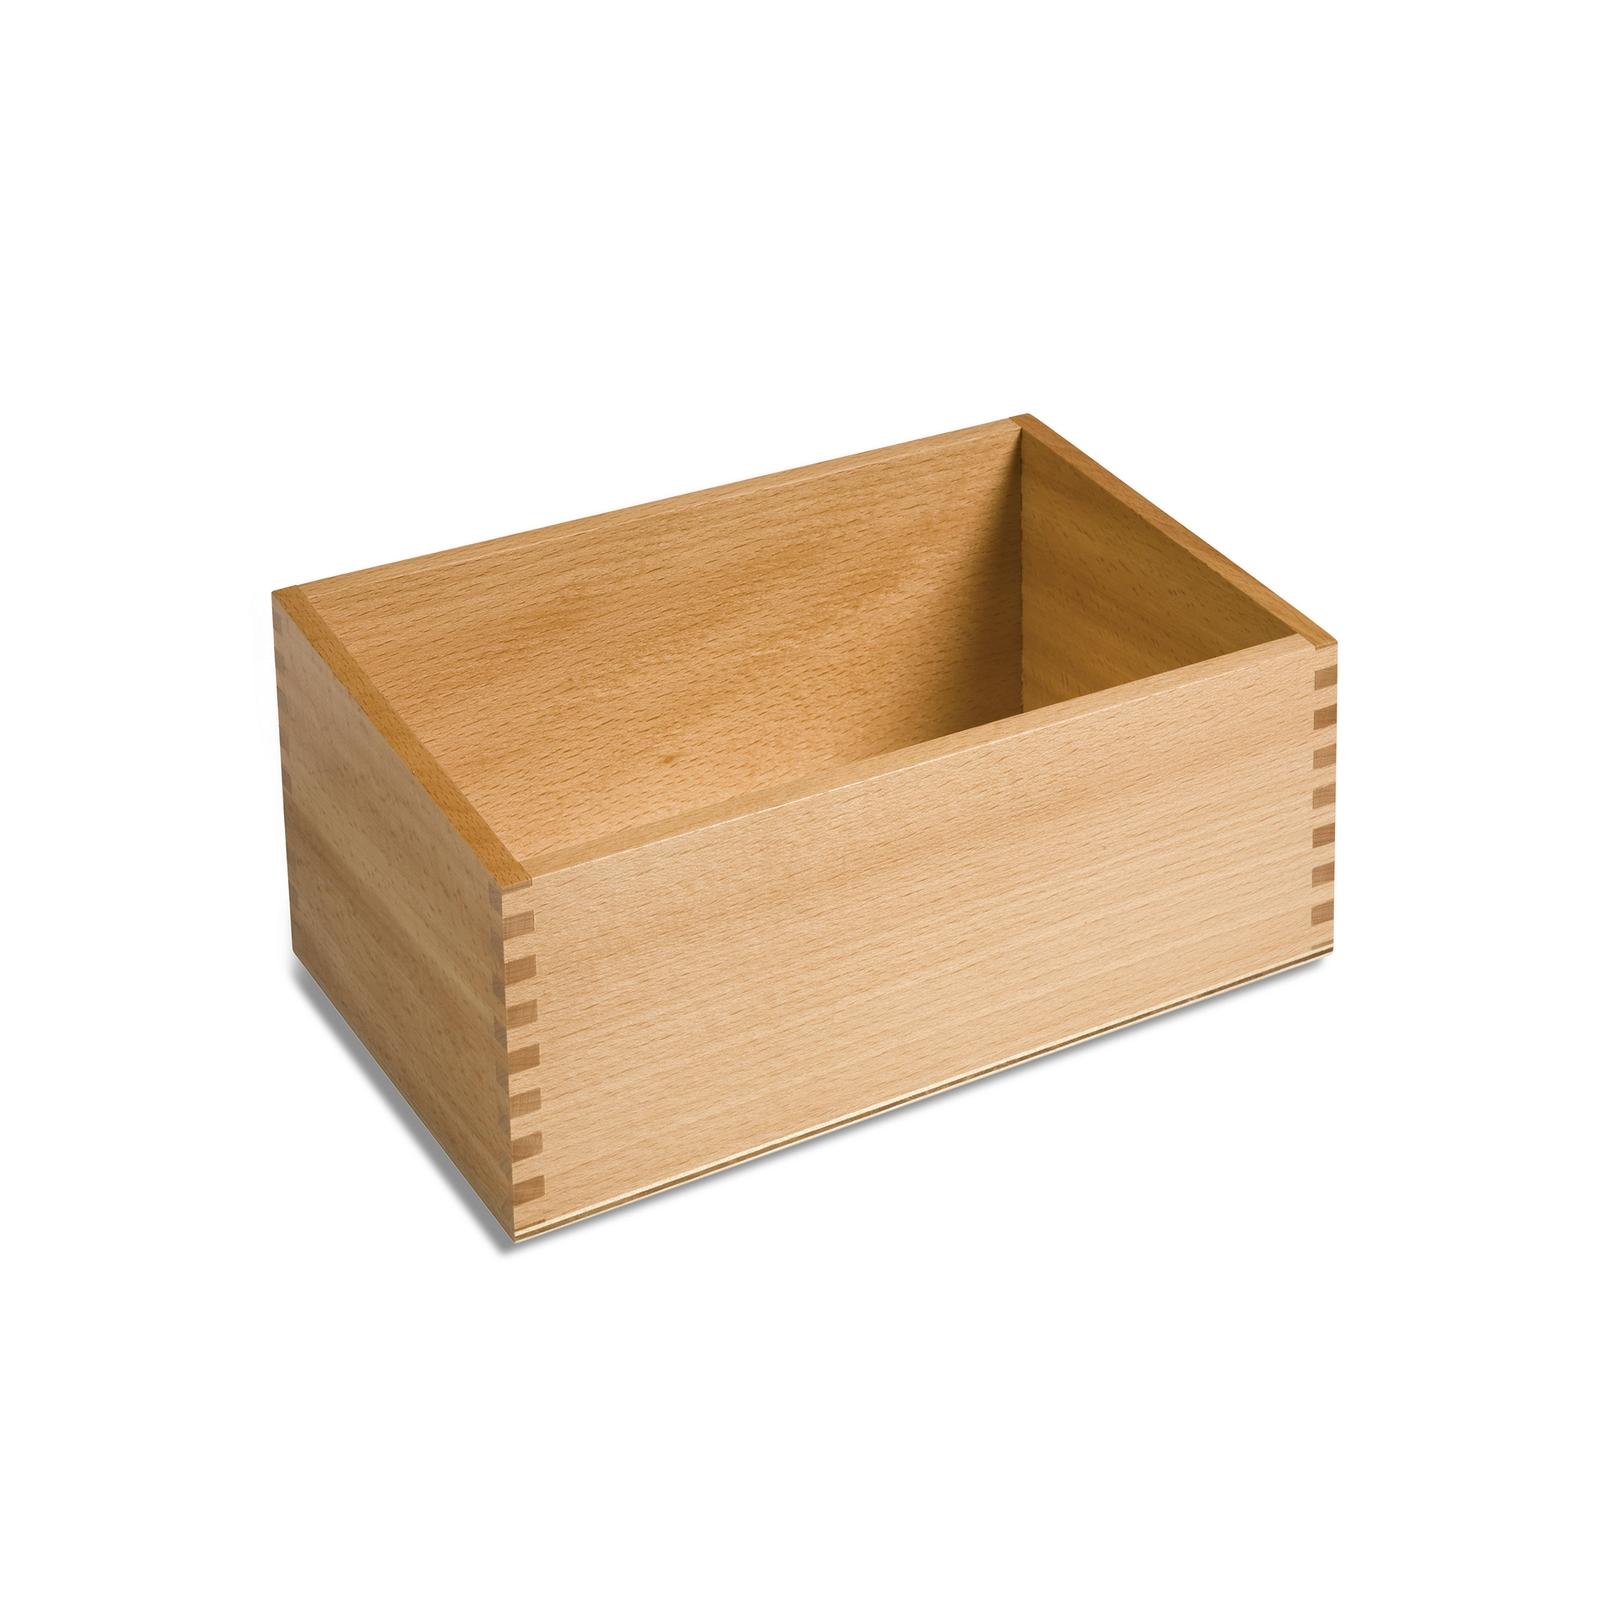 Sandpaper Letters Box